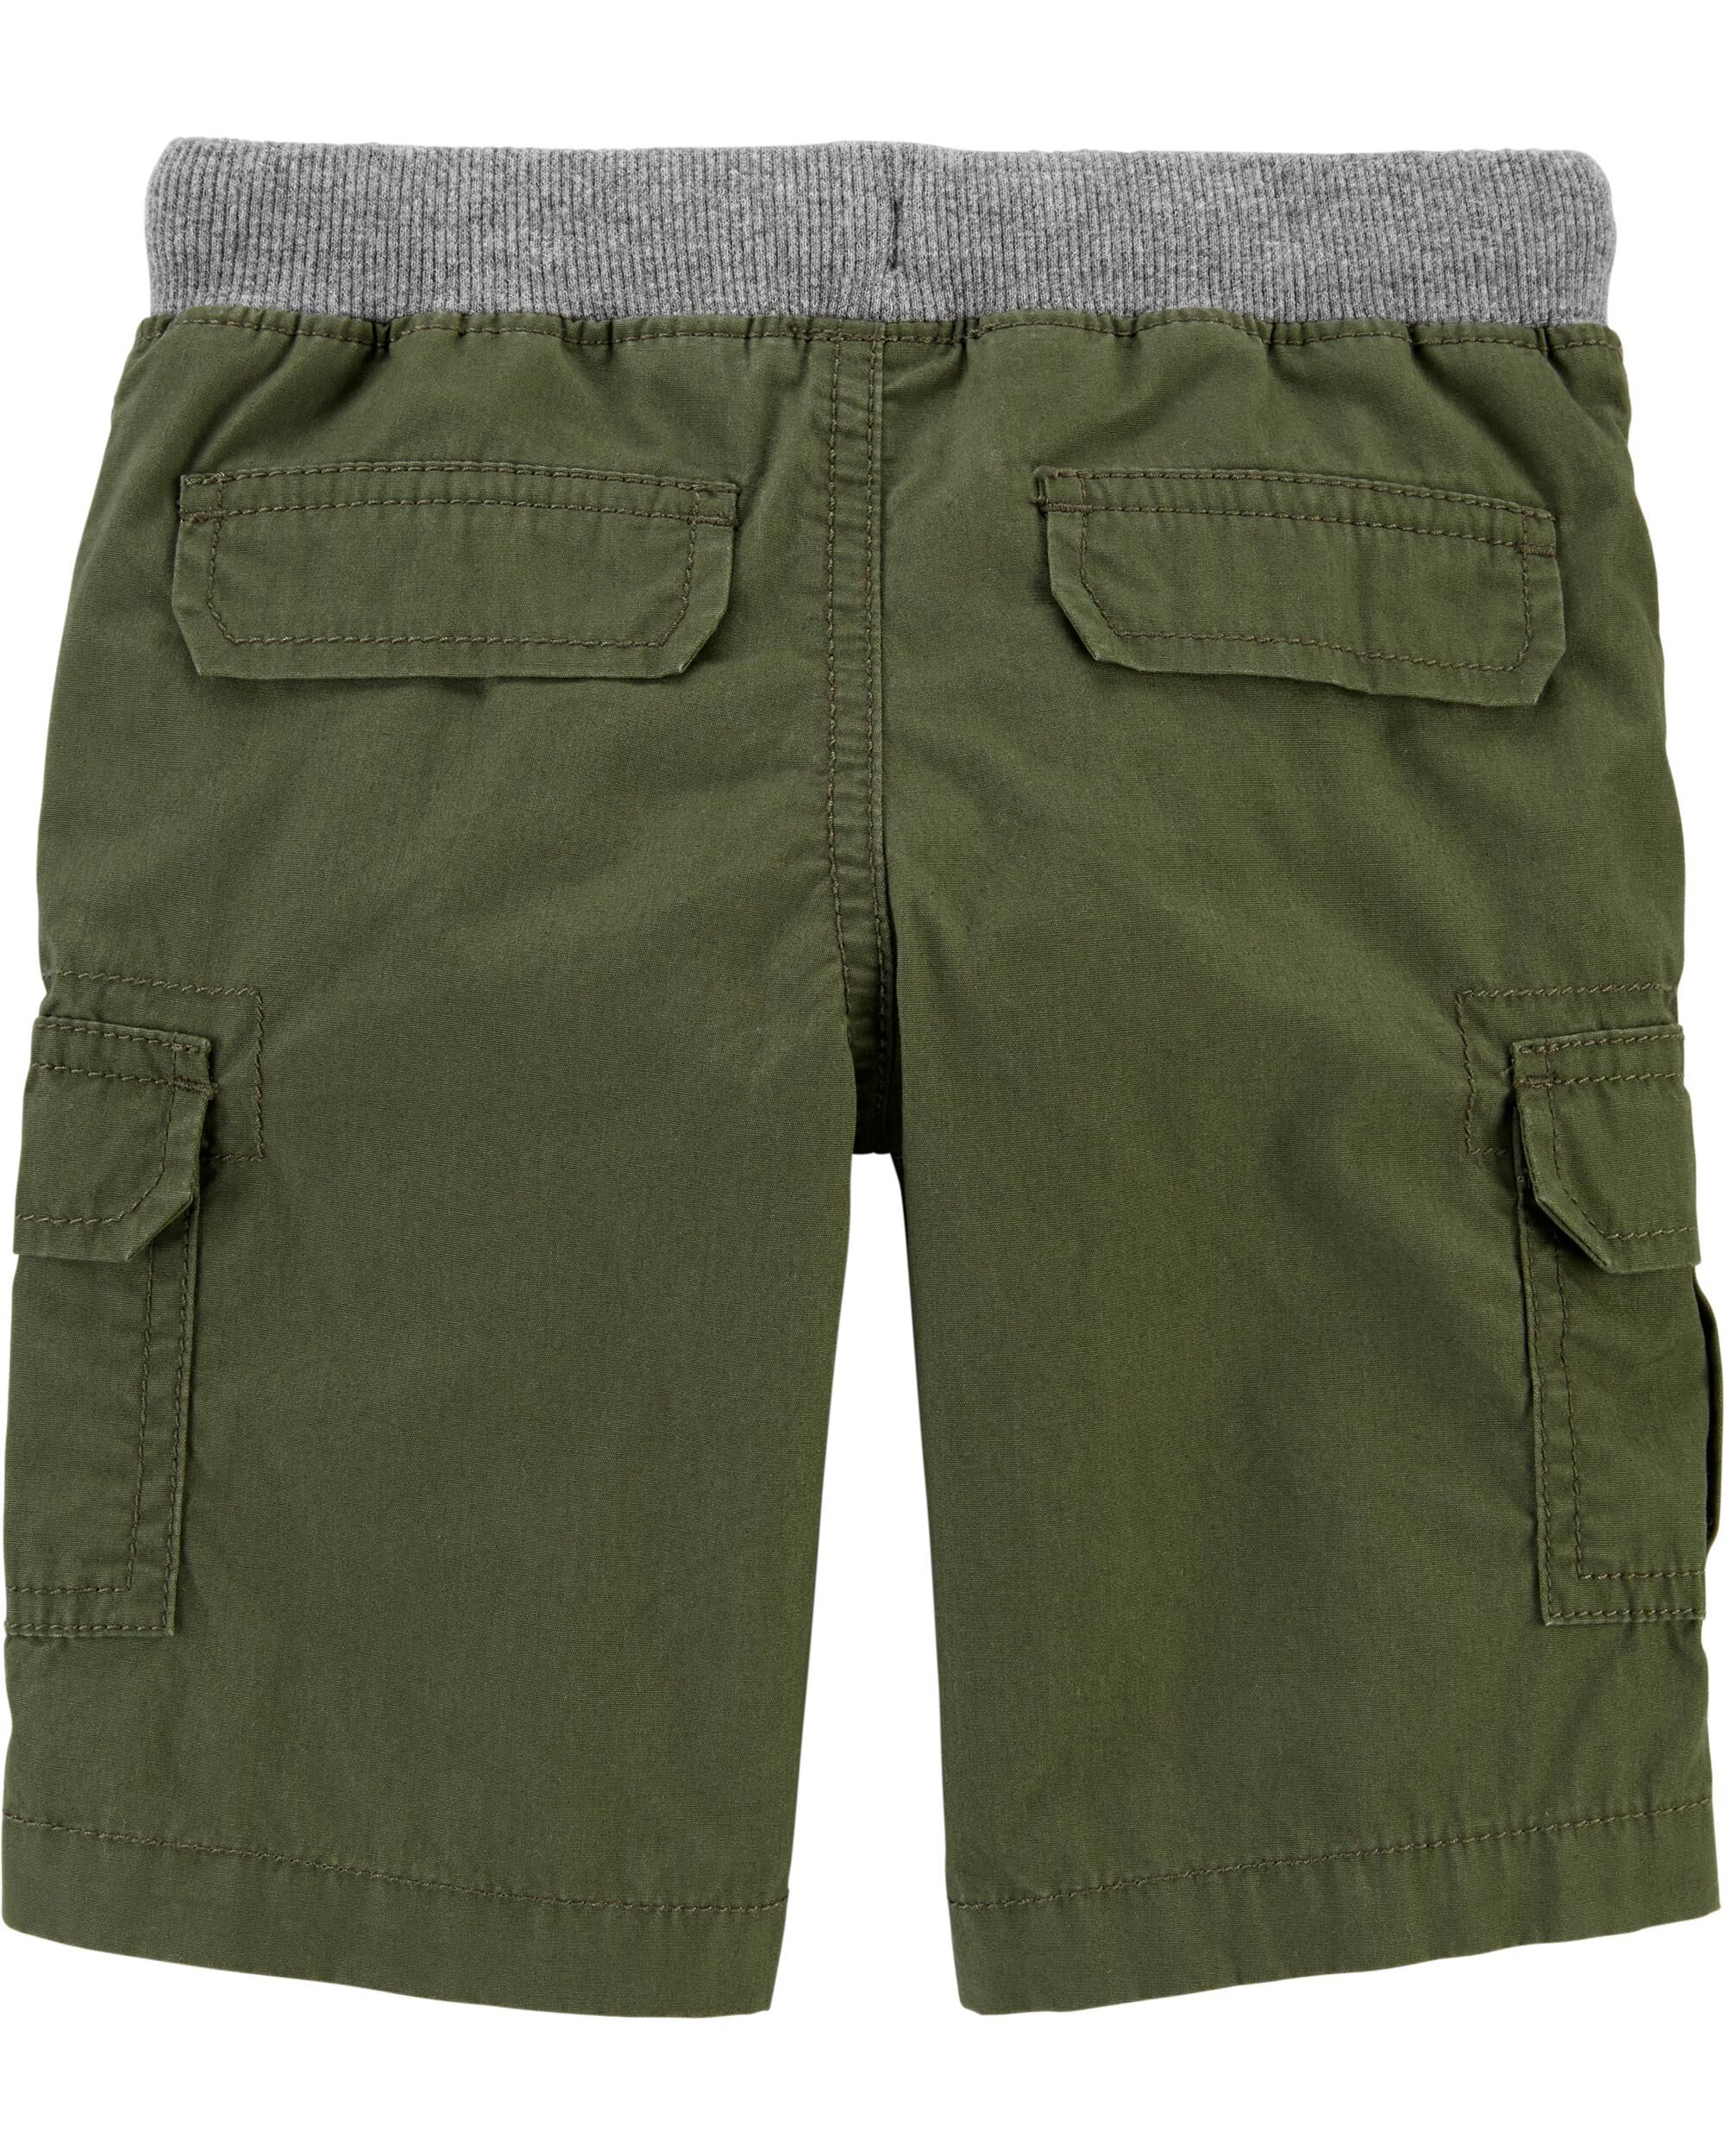 5-Toddler Carters Little Boys Flat Front Shorts Orange